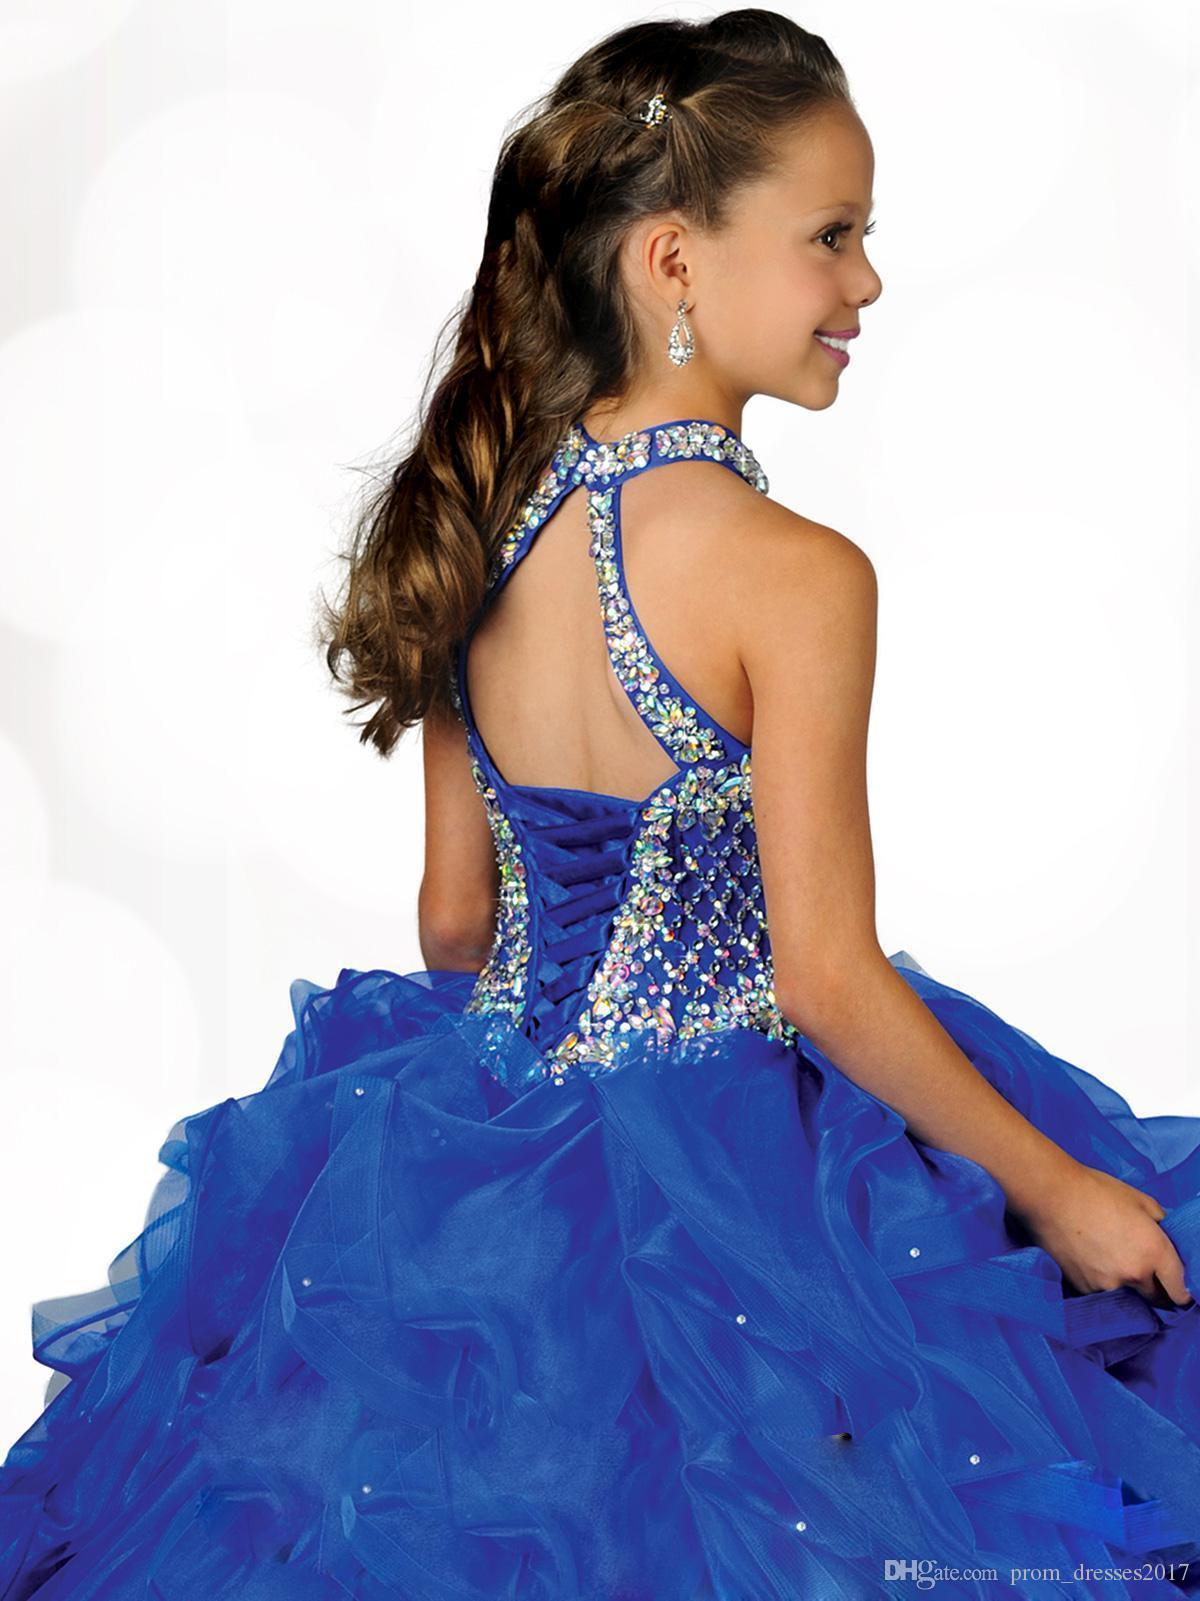 2020 Glamorous Halter High Decote Bordado Beading Beading Pequena Meninas Pageant Vestido Plissado Azul Organza Flor Meninas Dress Hy1188